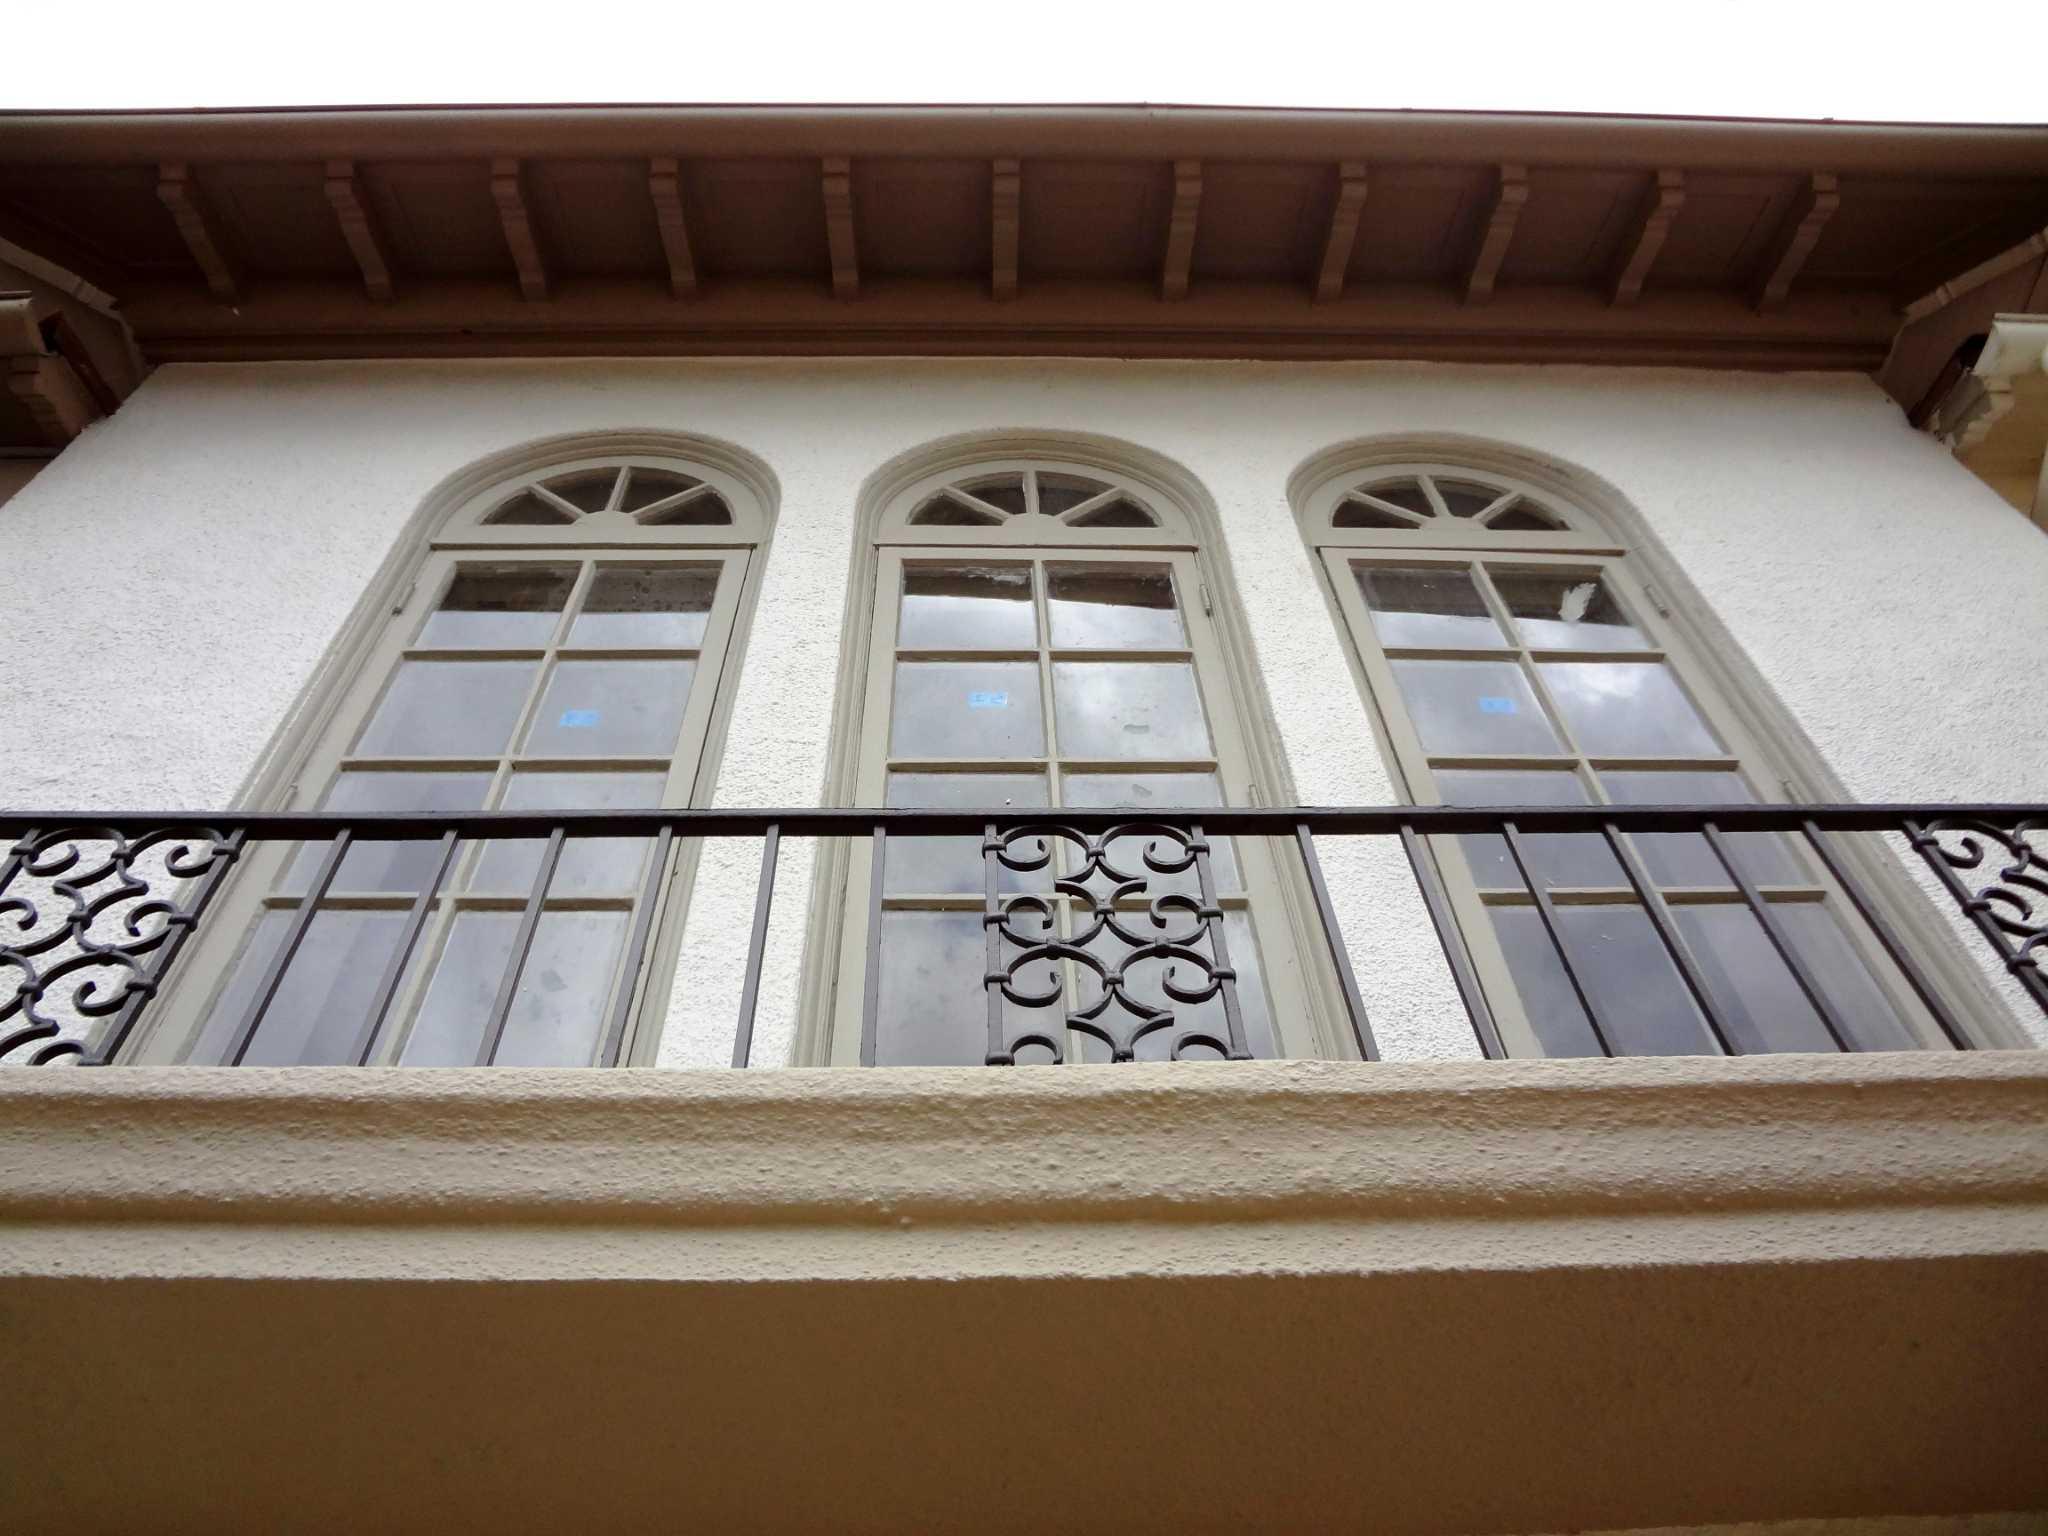 Historic Monte Vista renovation coming into focus - San Antonio Express-News (subscription)